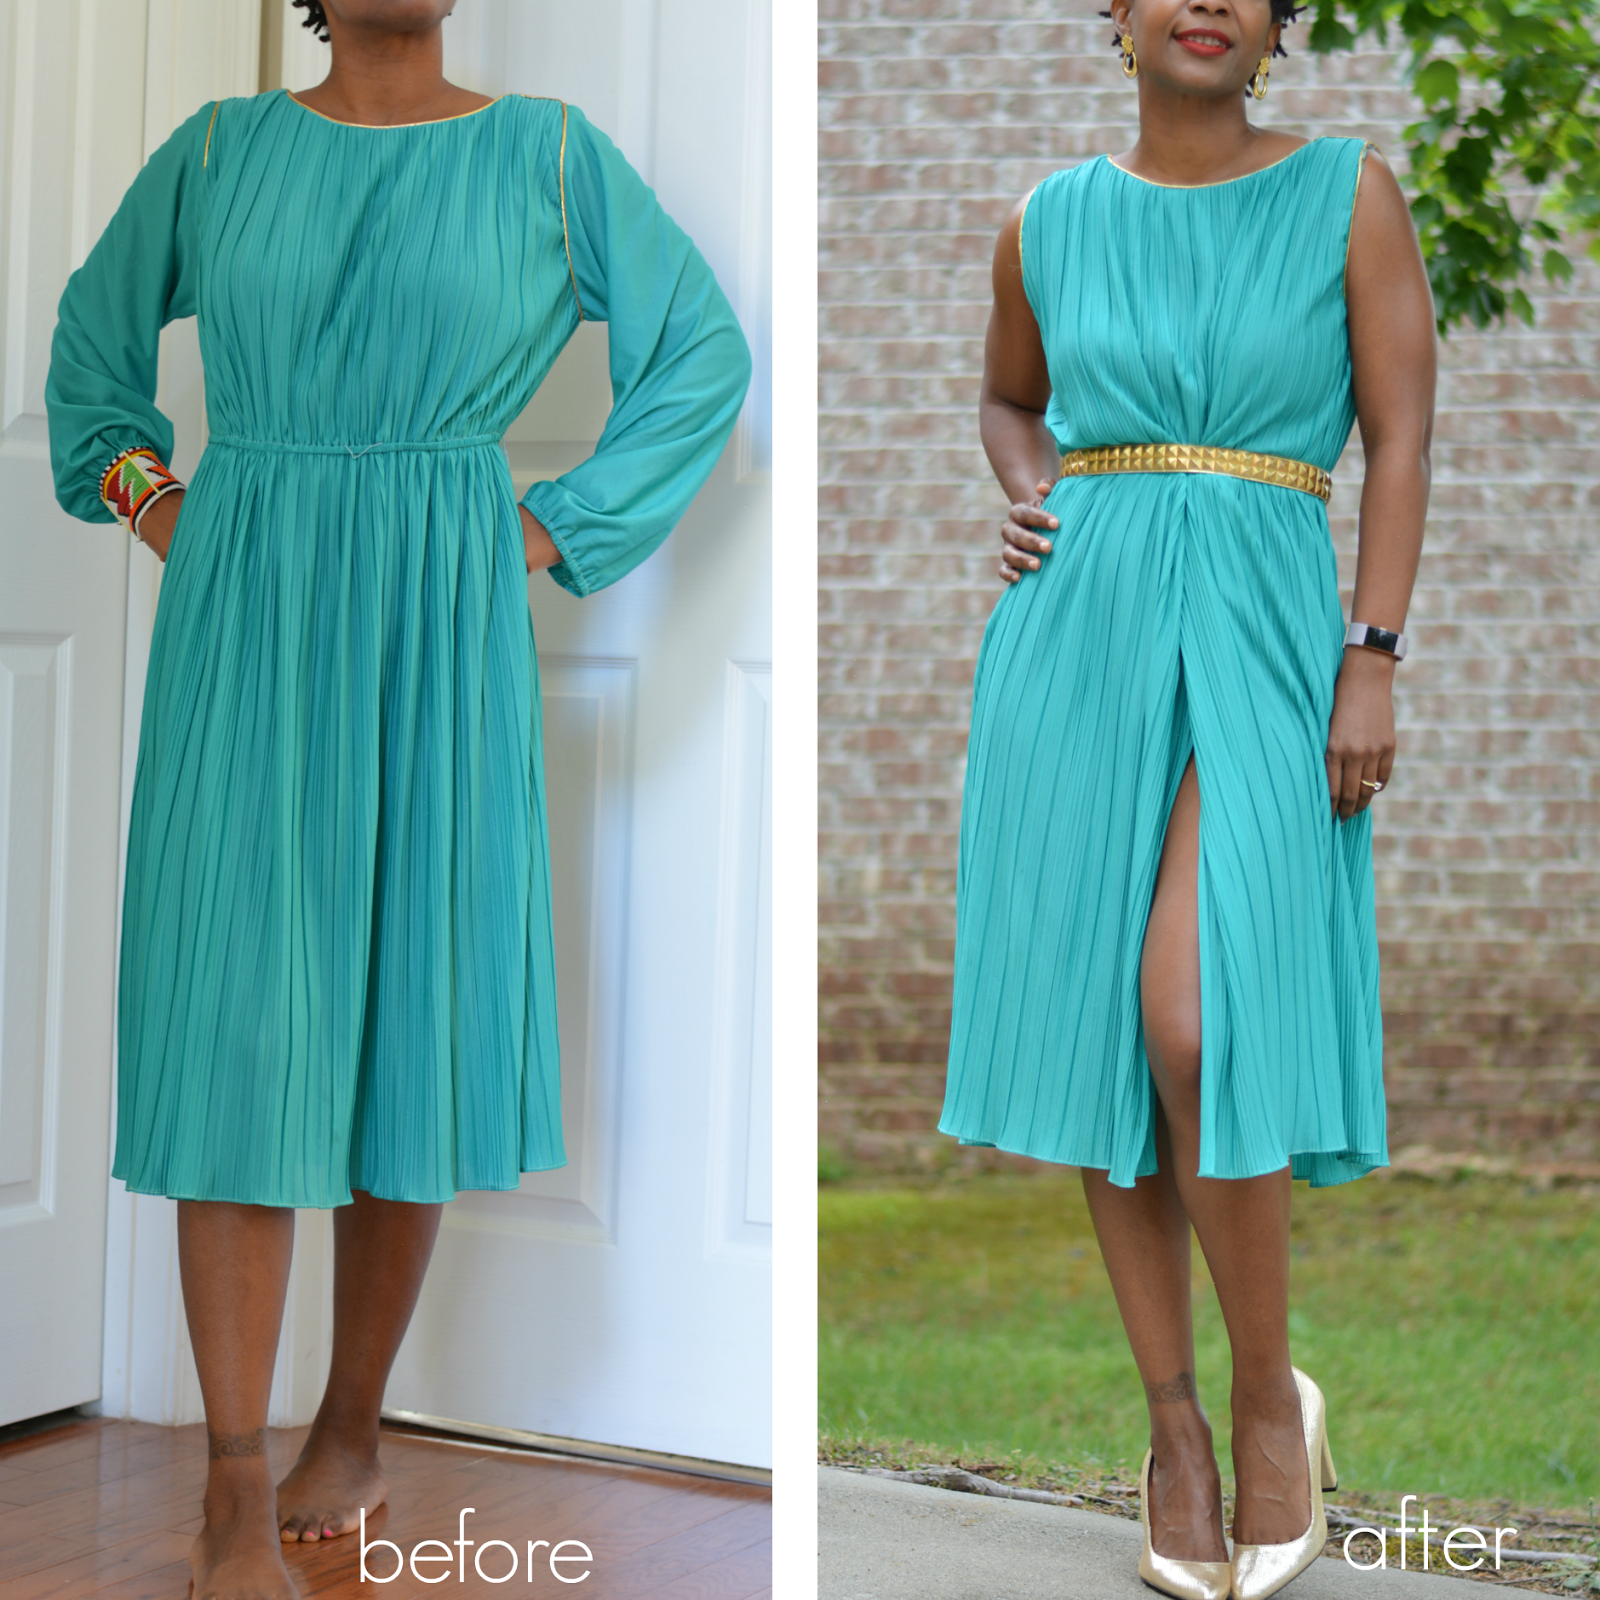 Diy Fashion Beauty Youtube: 3 Step Beast To Beauty Vintage Dress Makeover